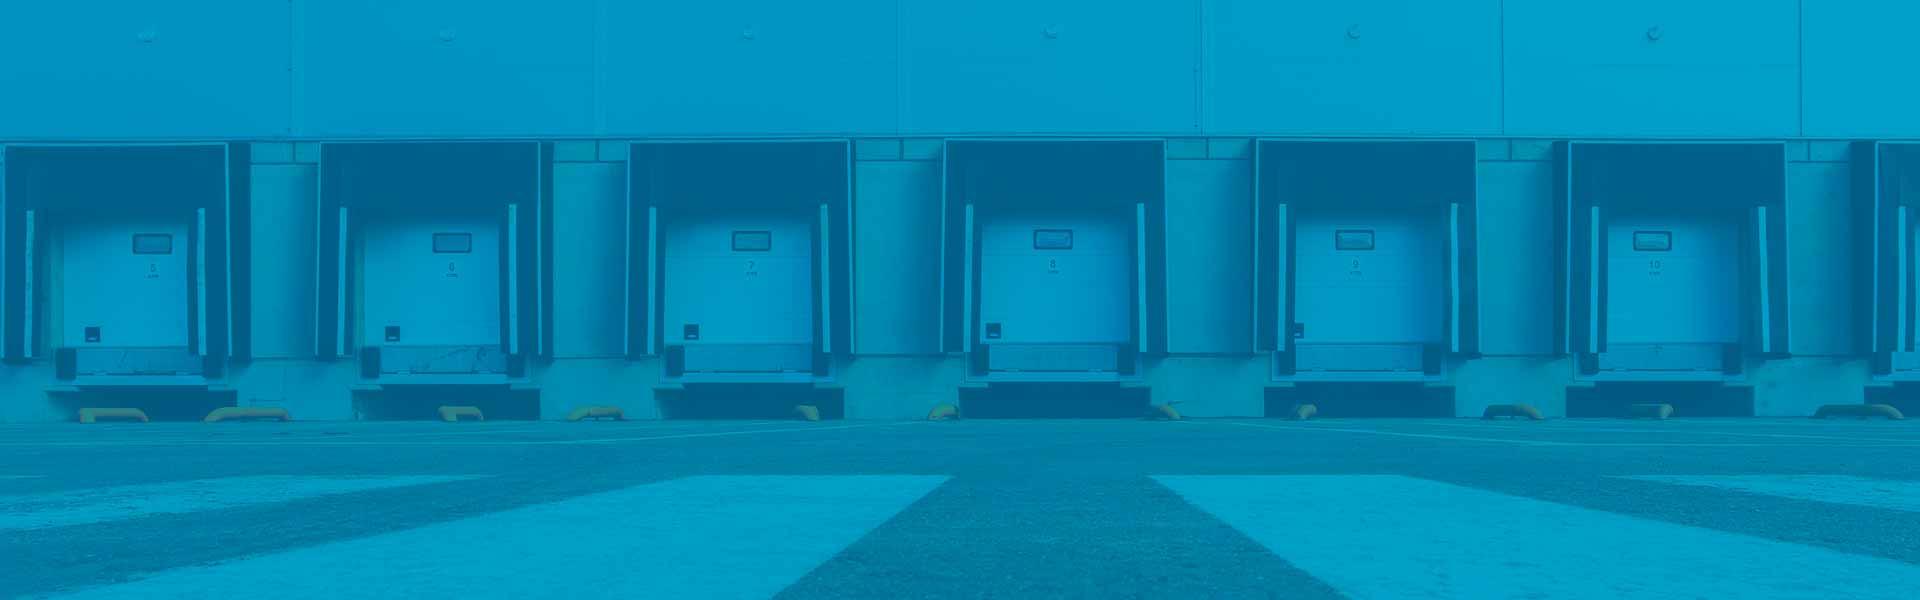 Warehouse Simulation Software – AnyLogic Simulation Software